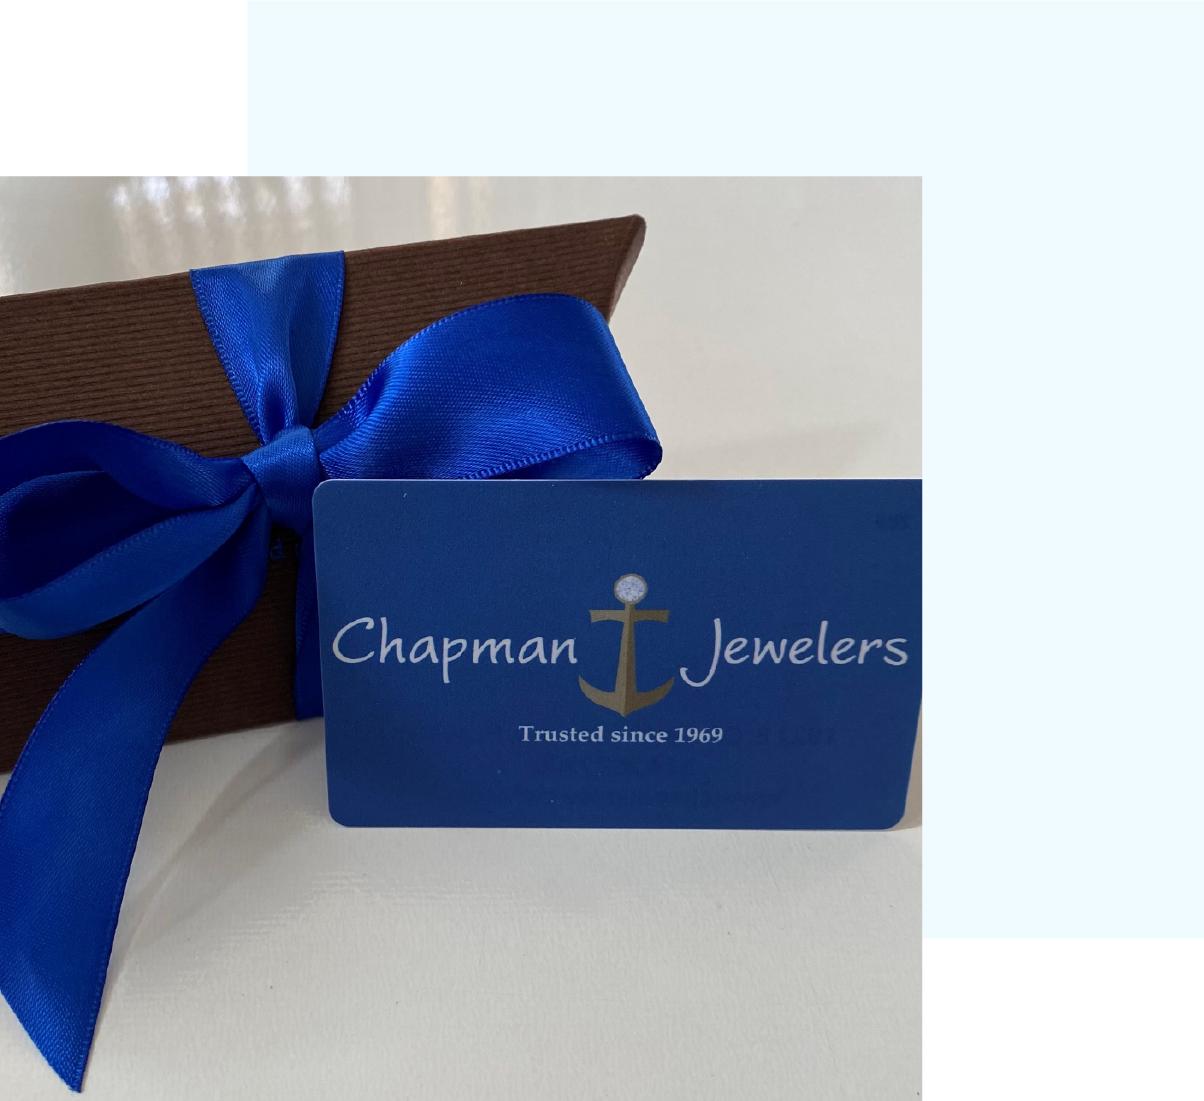 Chapman Jewelers_Chapman Jewelers Gift Cards